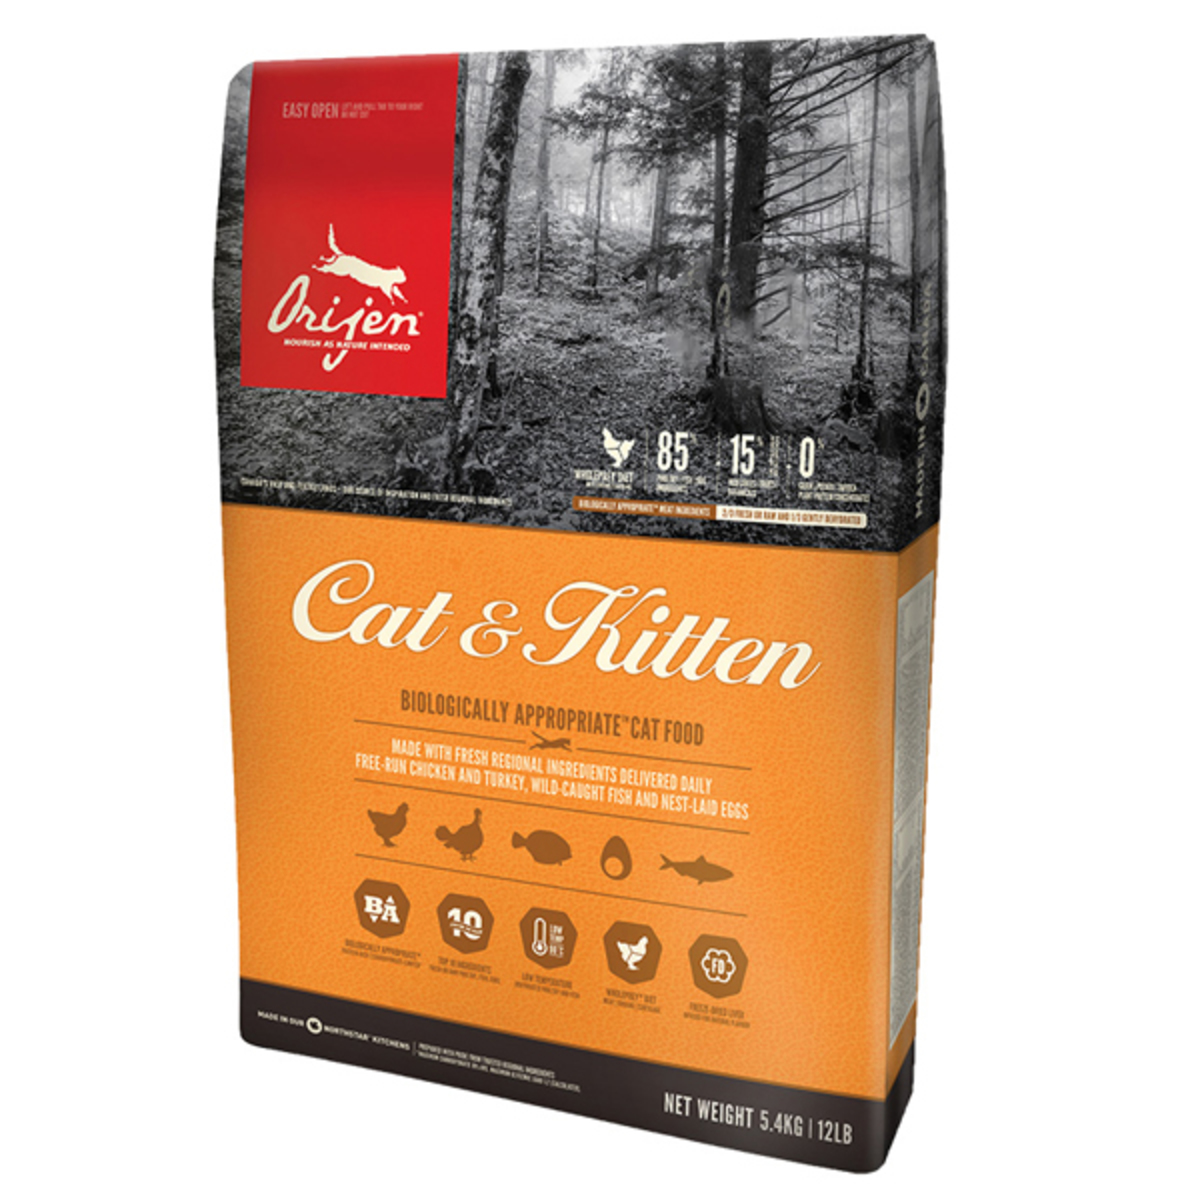 Canada Delivers Cat & Kitten Cat Food 5.4kg